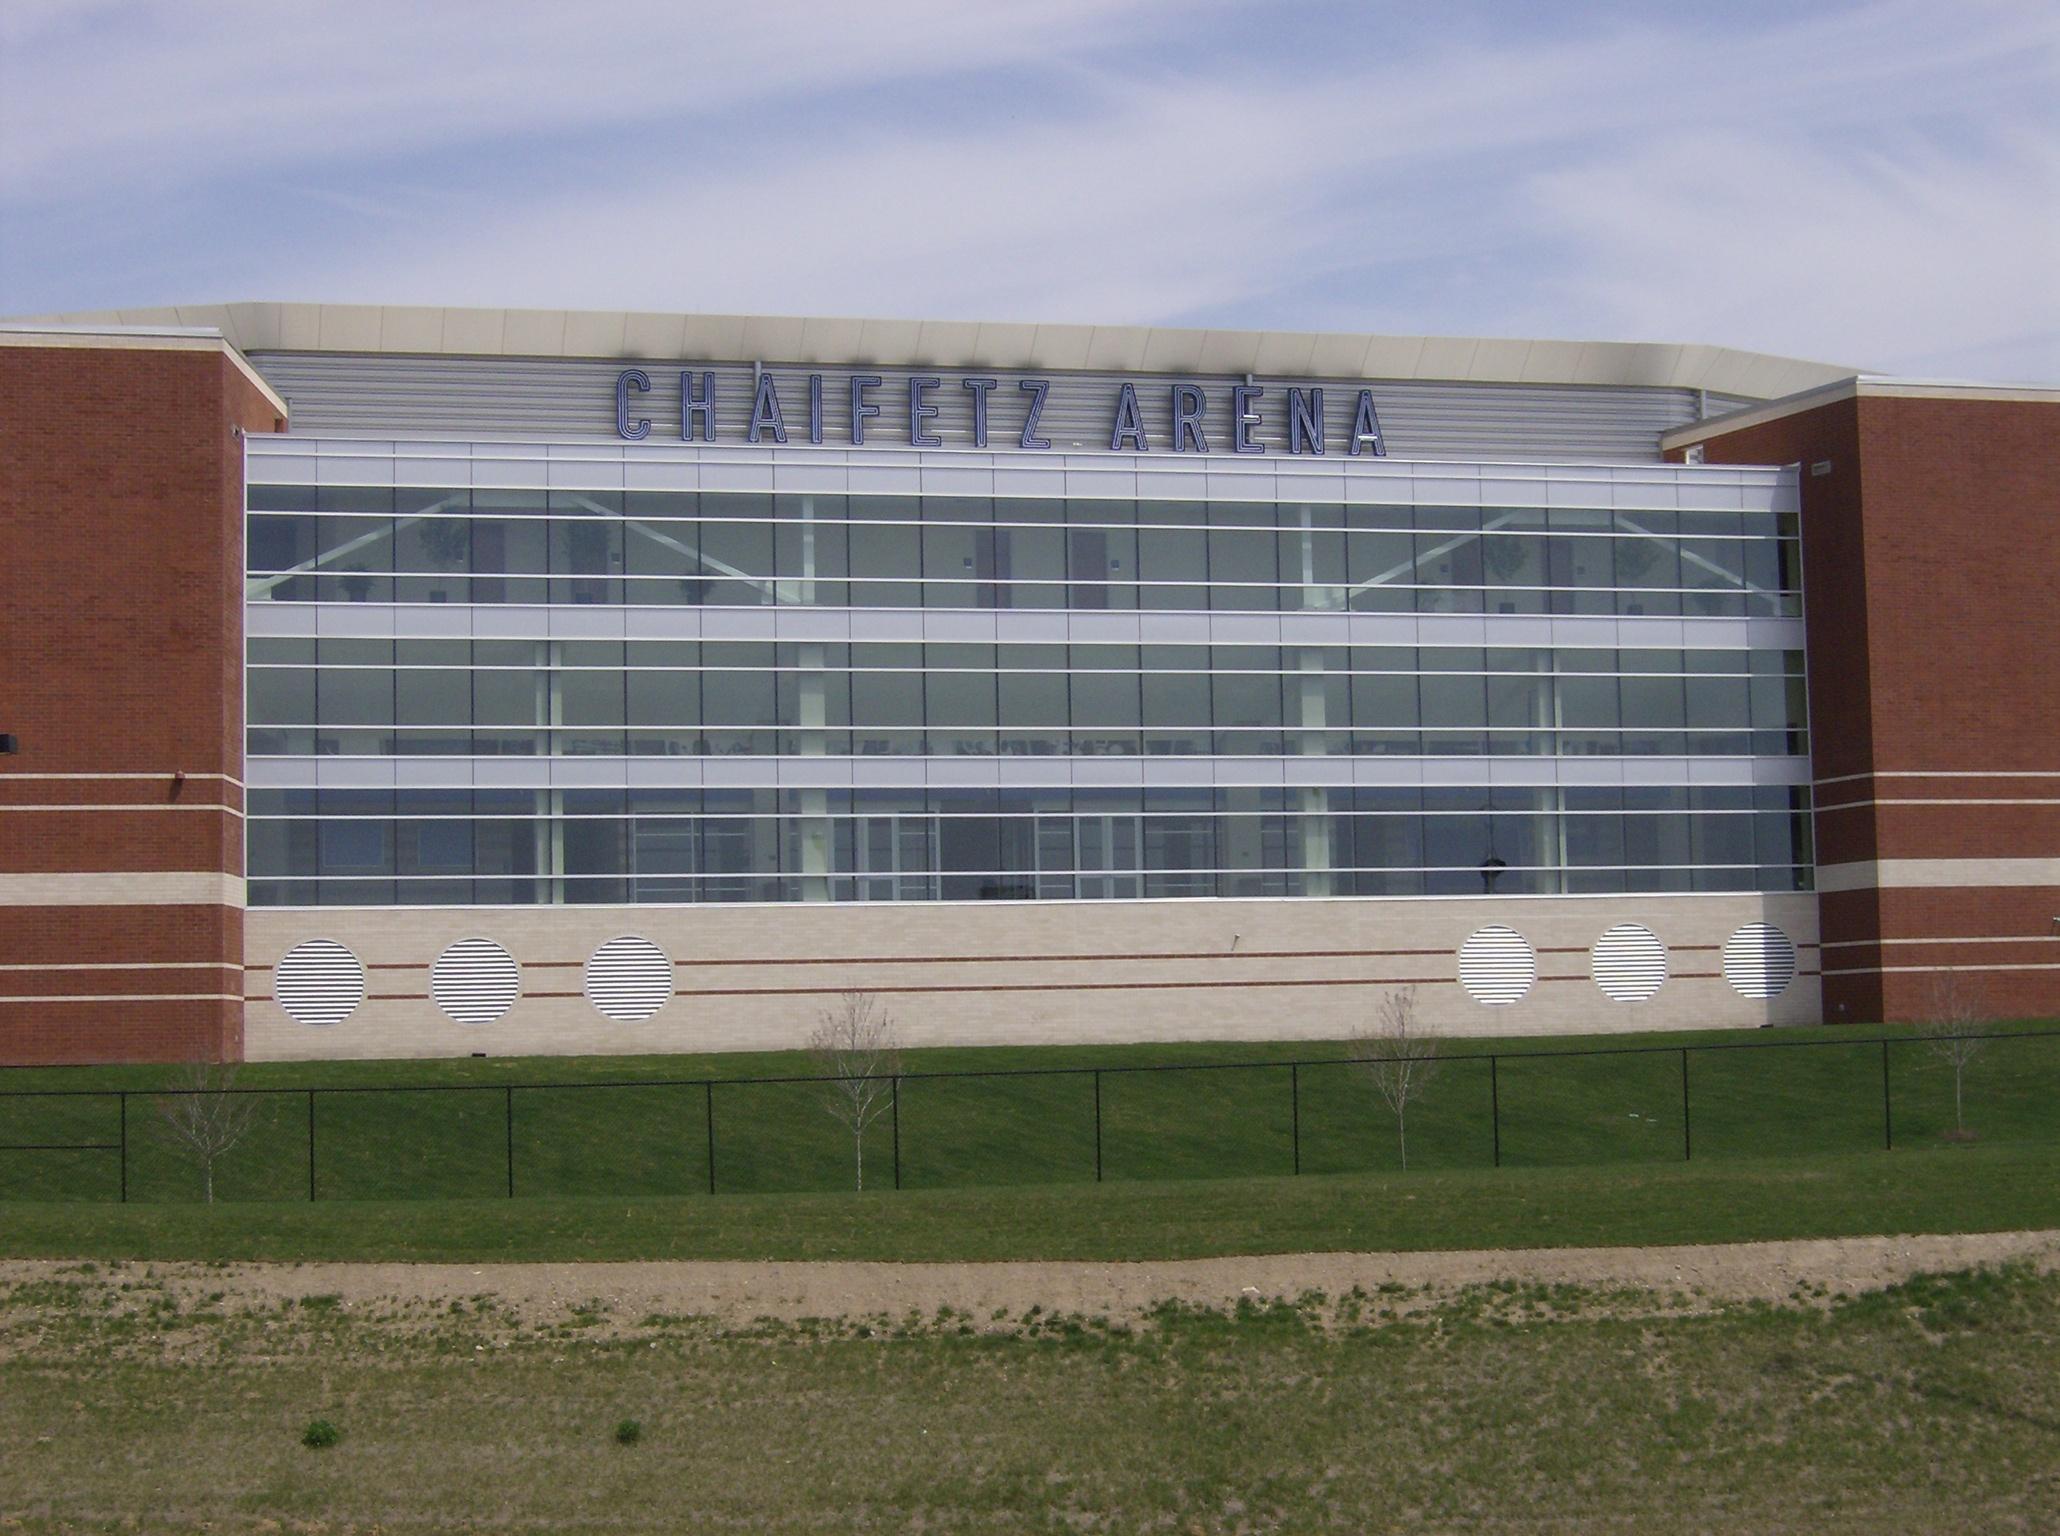 Chaifetz-Arena-Main-Sign-James-Mohrmann-2008-04-15